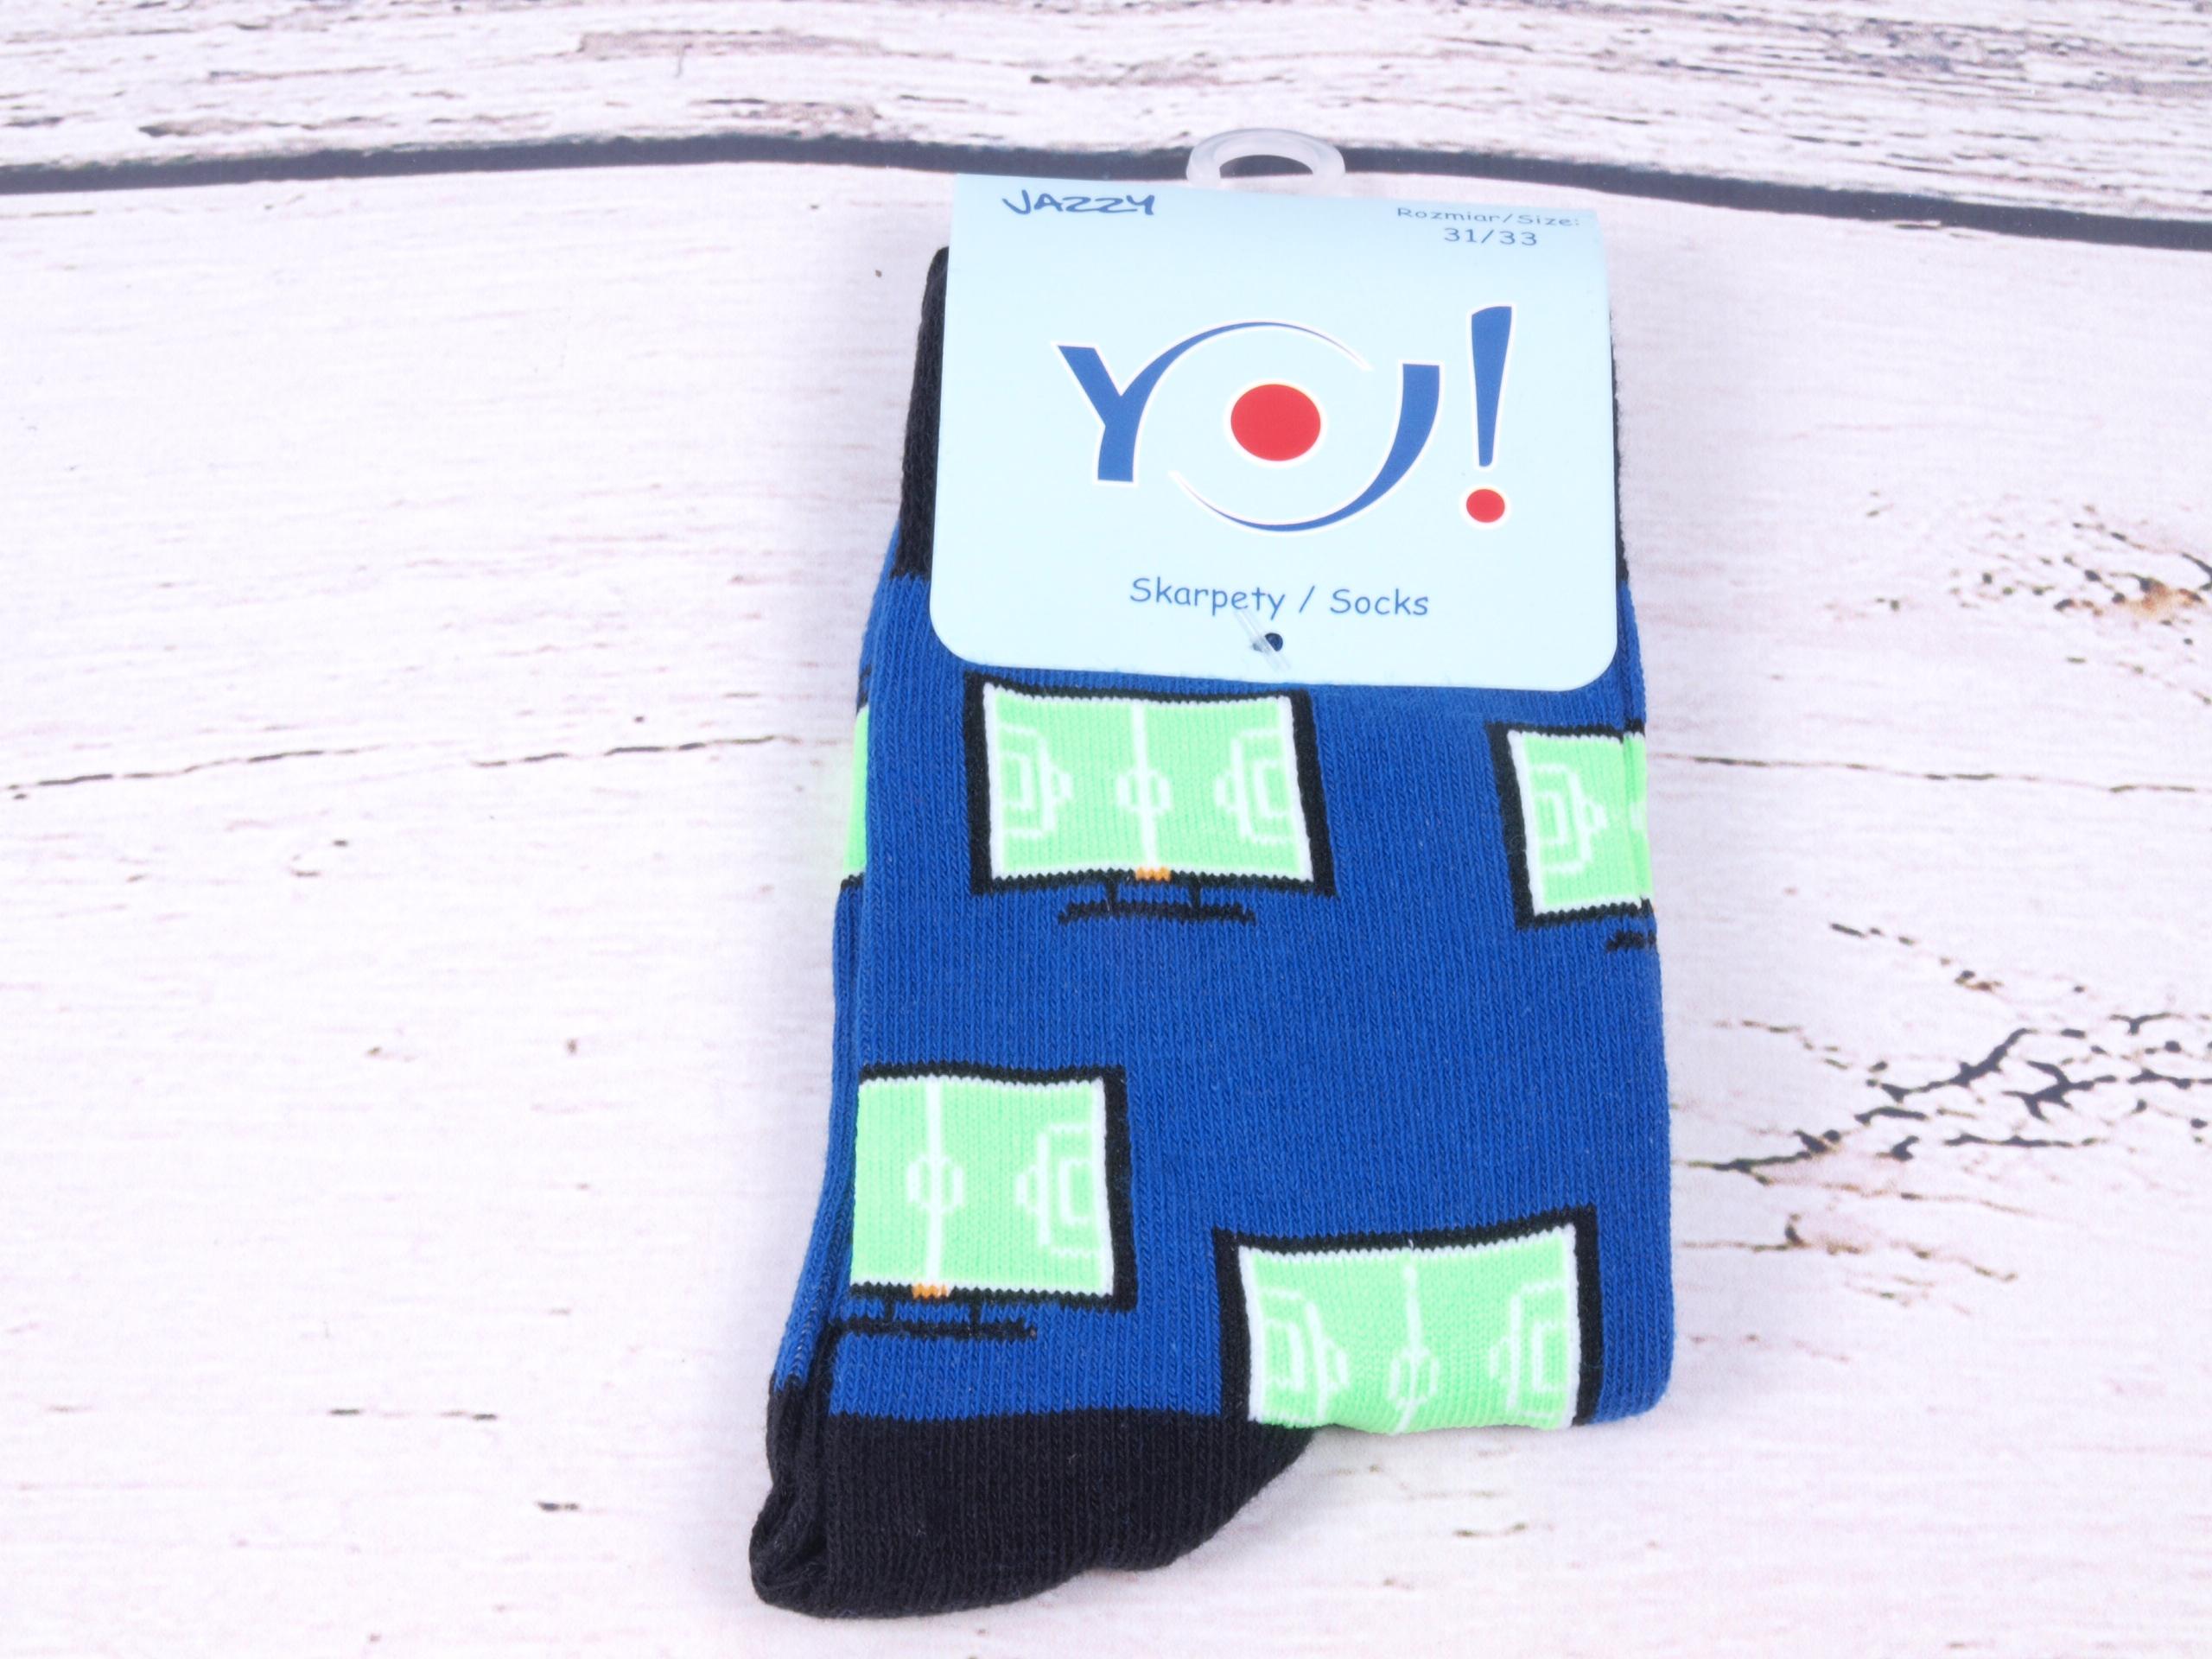 Ponožky YO Jazzy modrozelené s monitory velikosti ponožek: 22-23,5 ( EUR vel. 34-36)